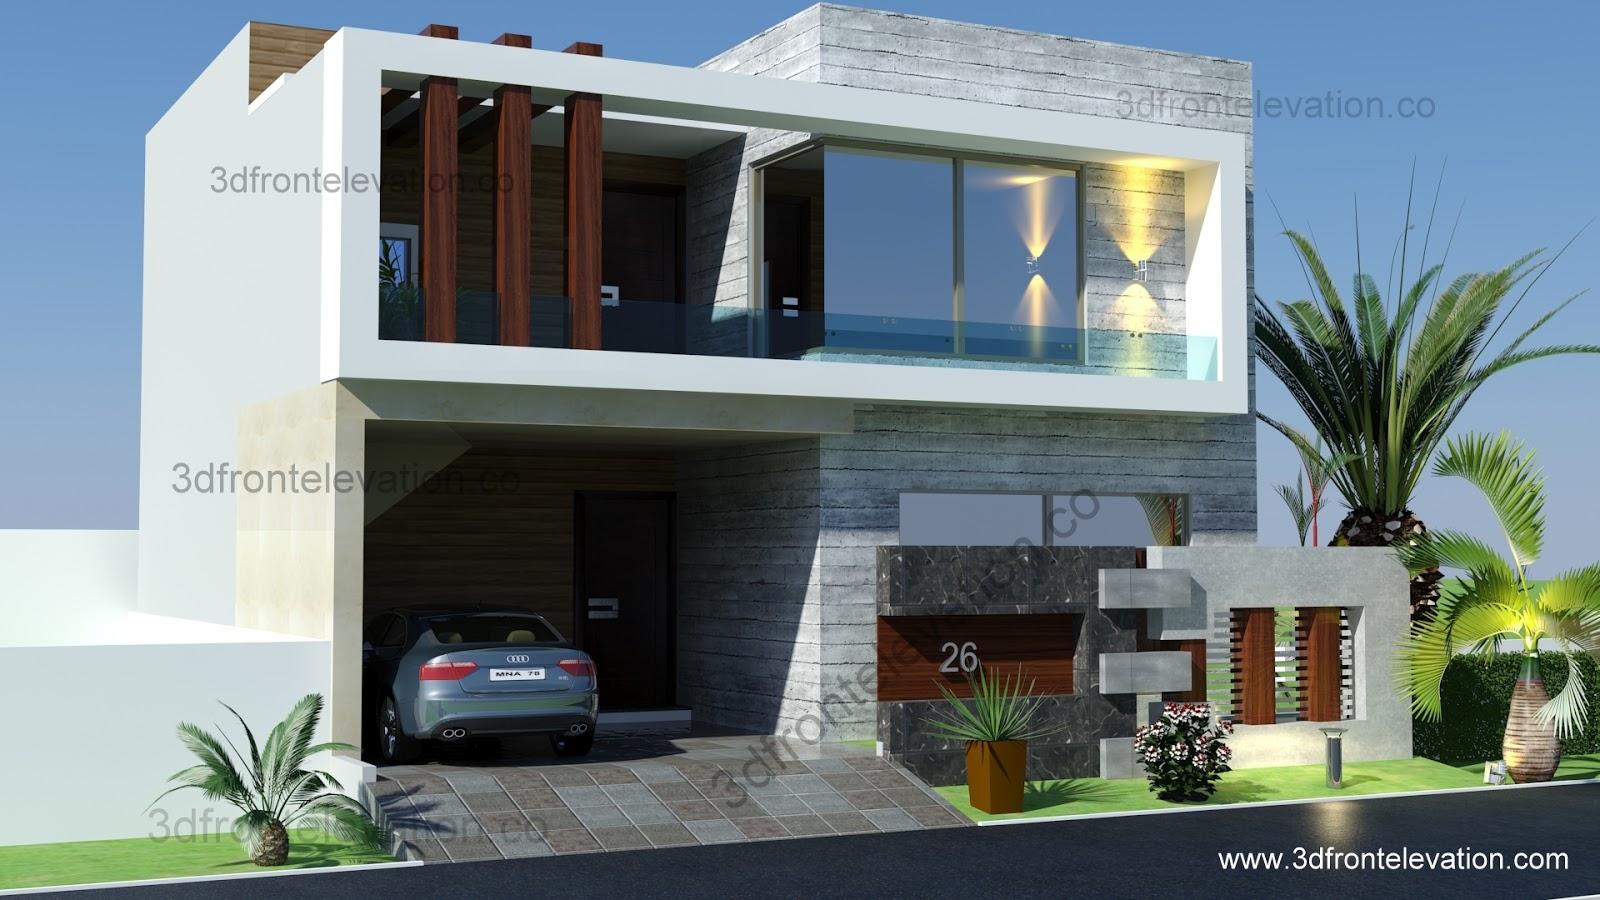 10 marla house elevation